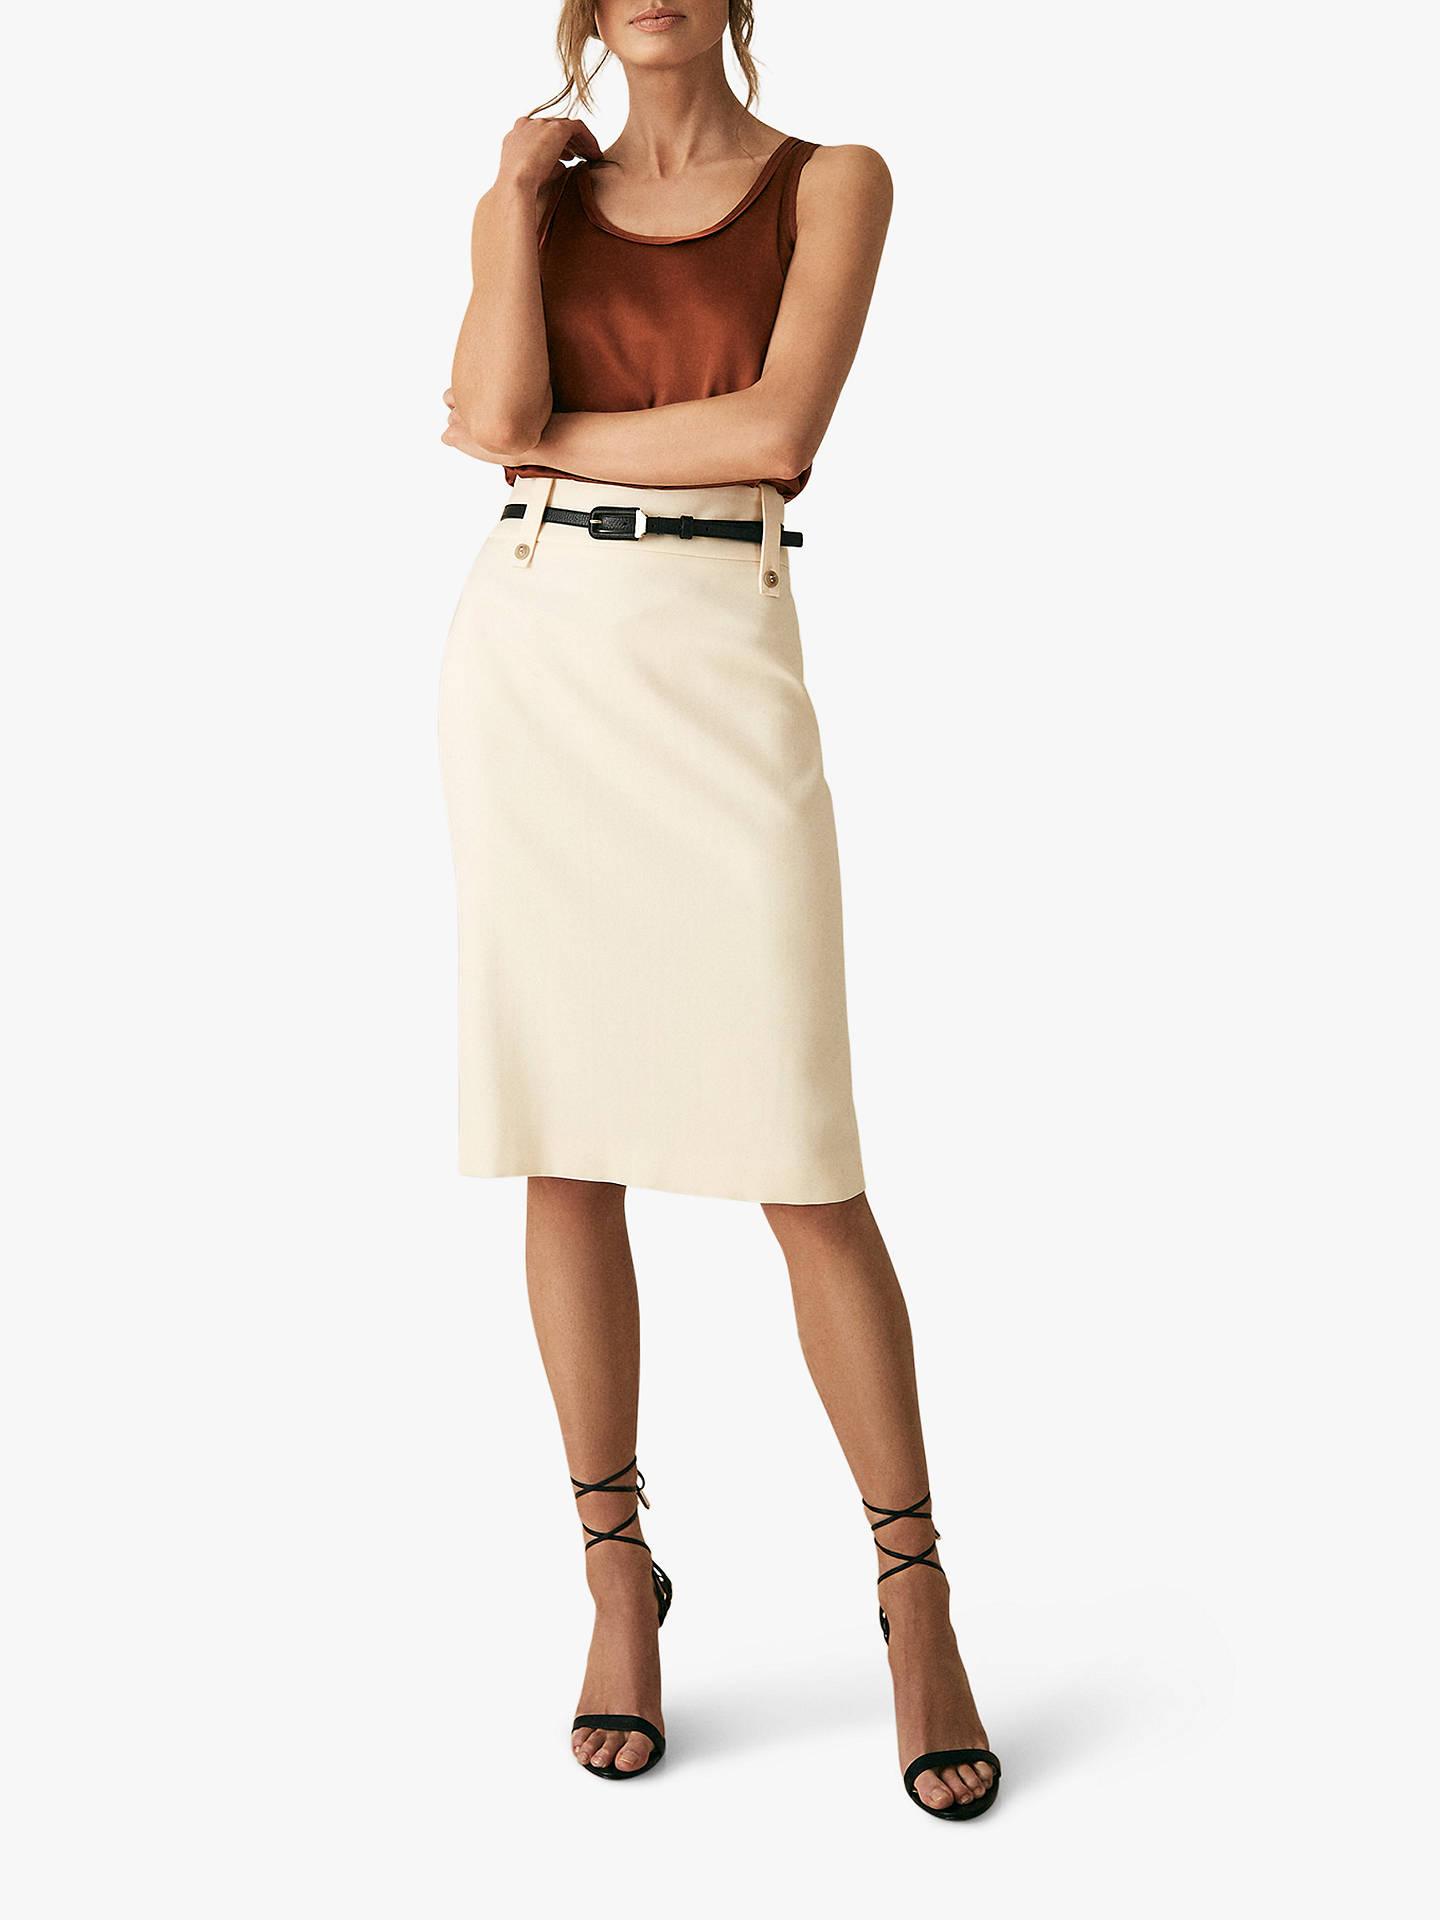 a466d61980 ... Buy Reiss Lennox Pencil Skirt, Off White, 6 Online at johnlewis.com ...